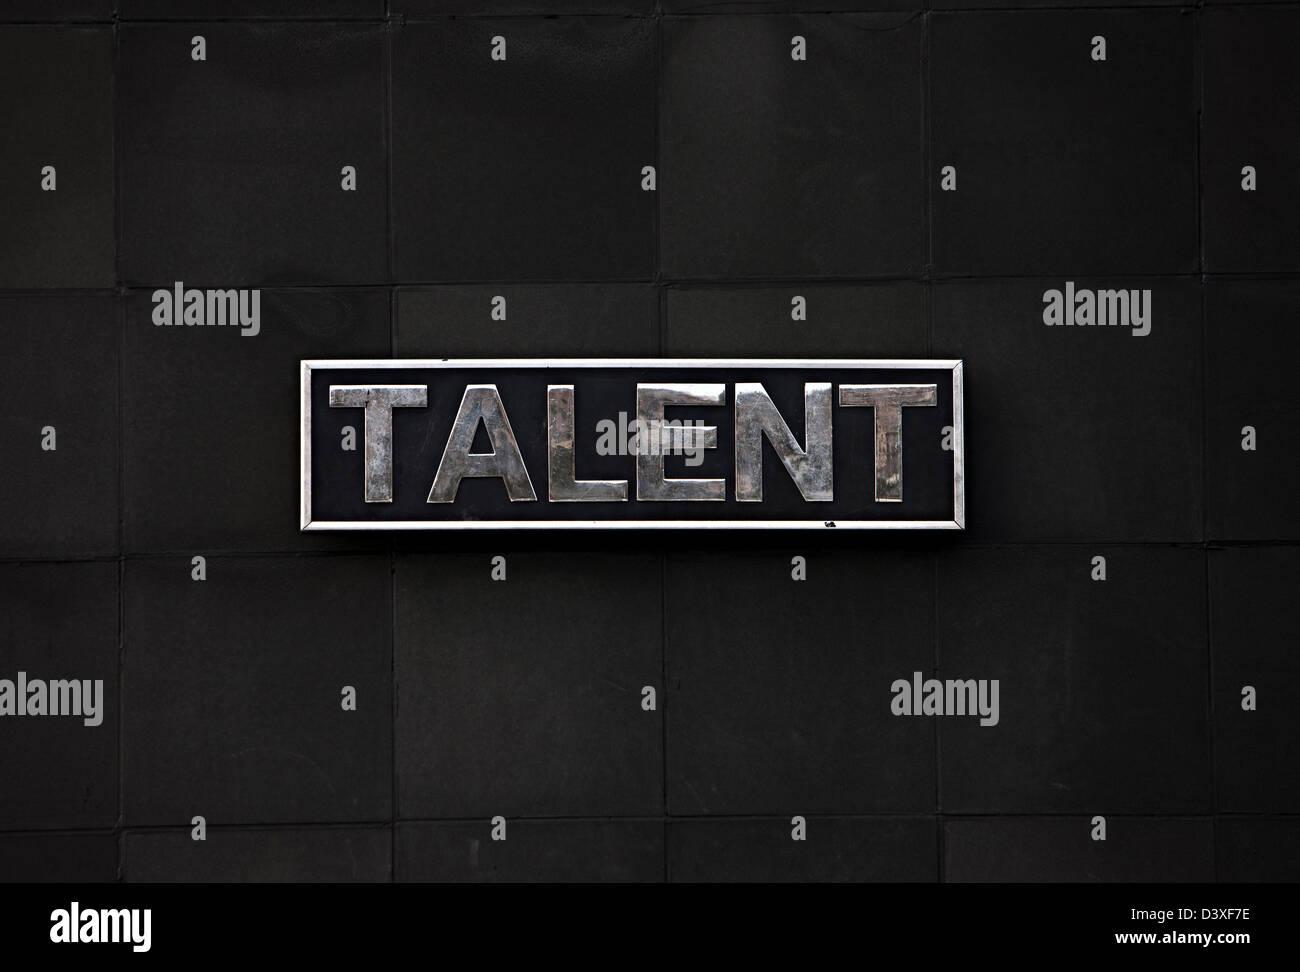 Nuclear Submarine HMS Talent, Egypt - Stock Image